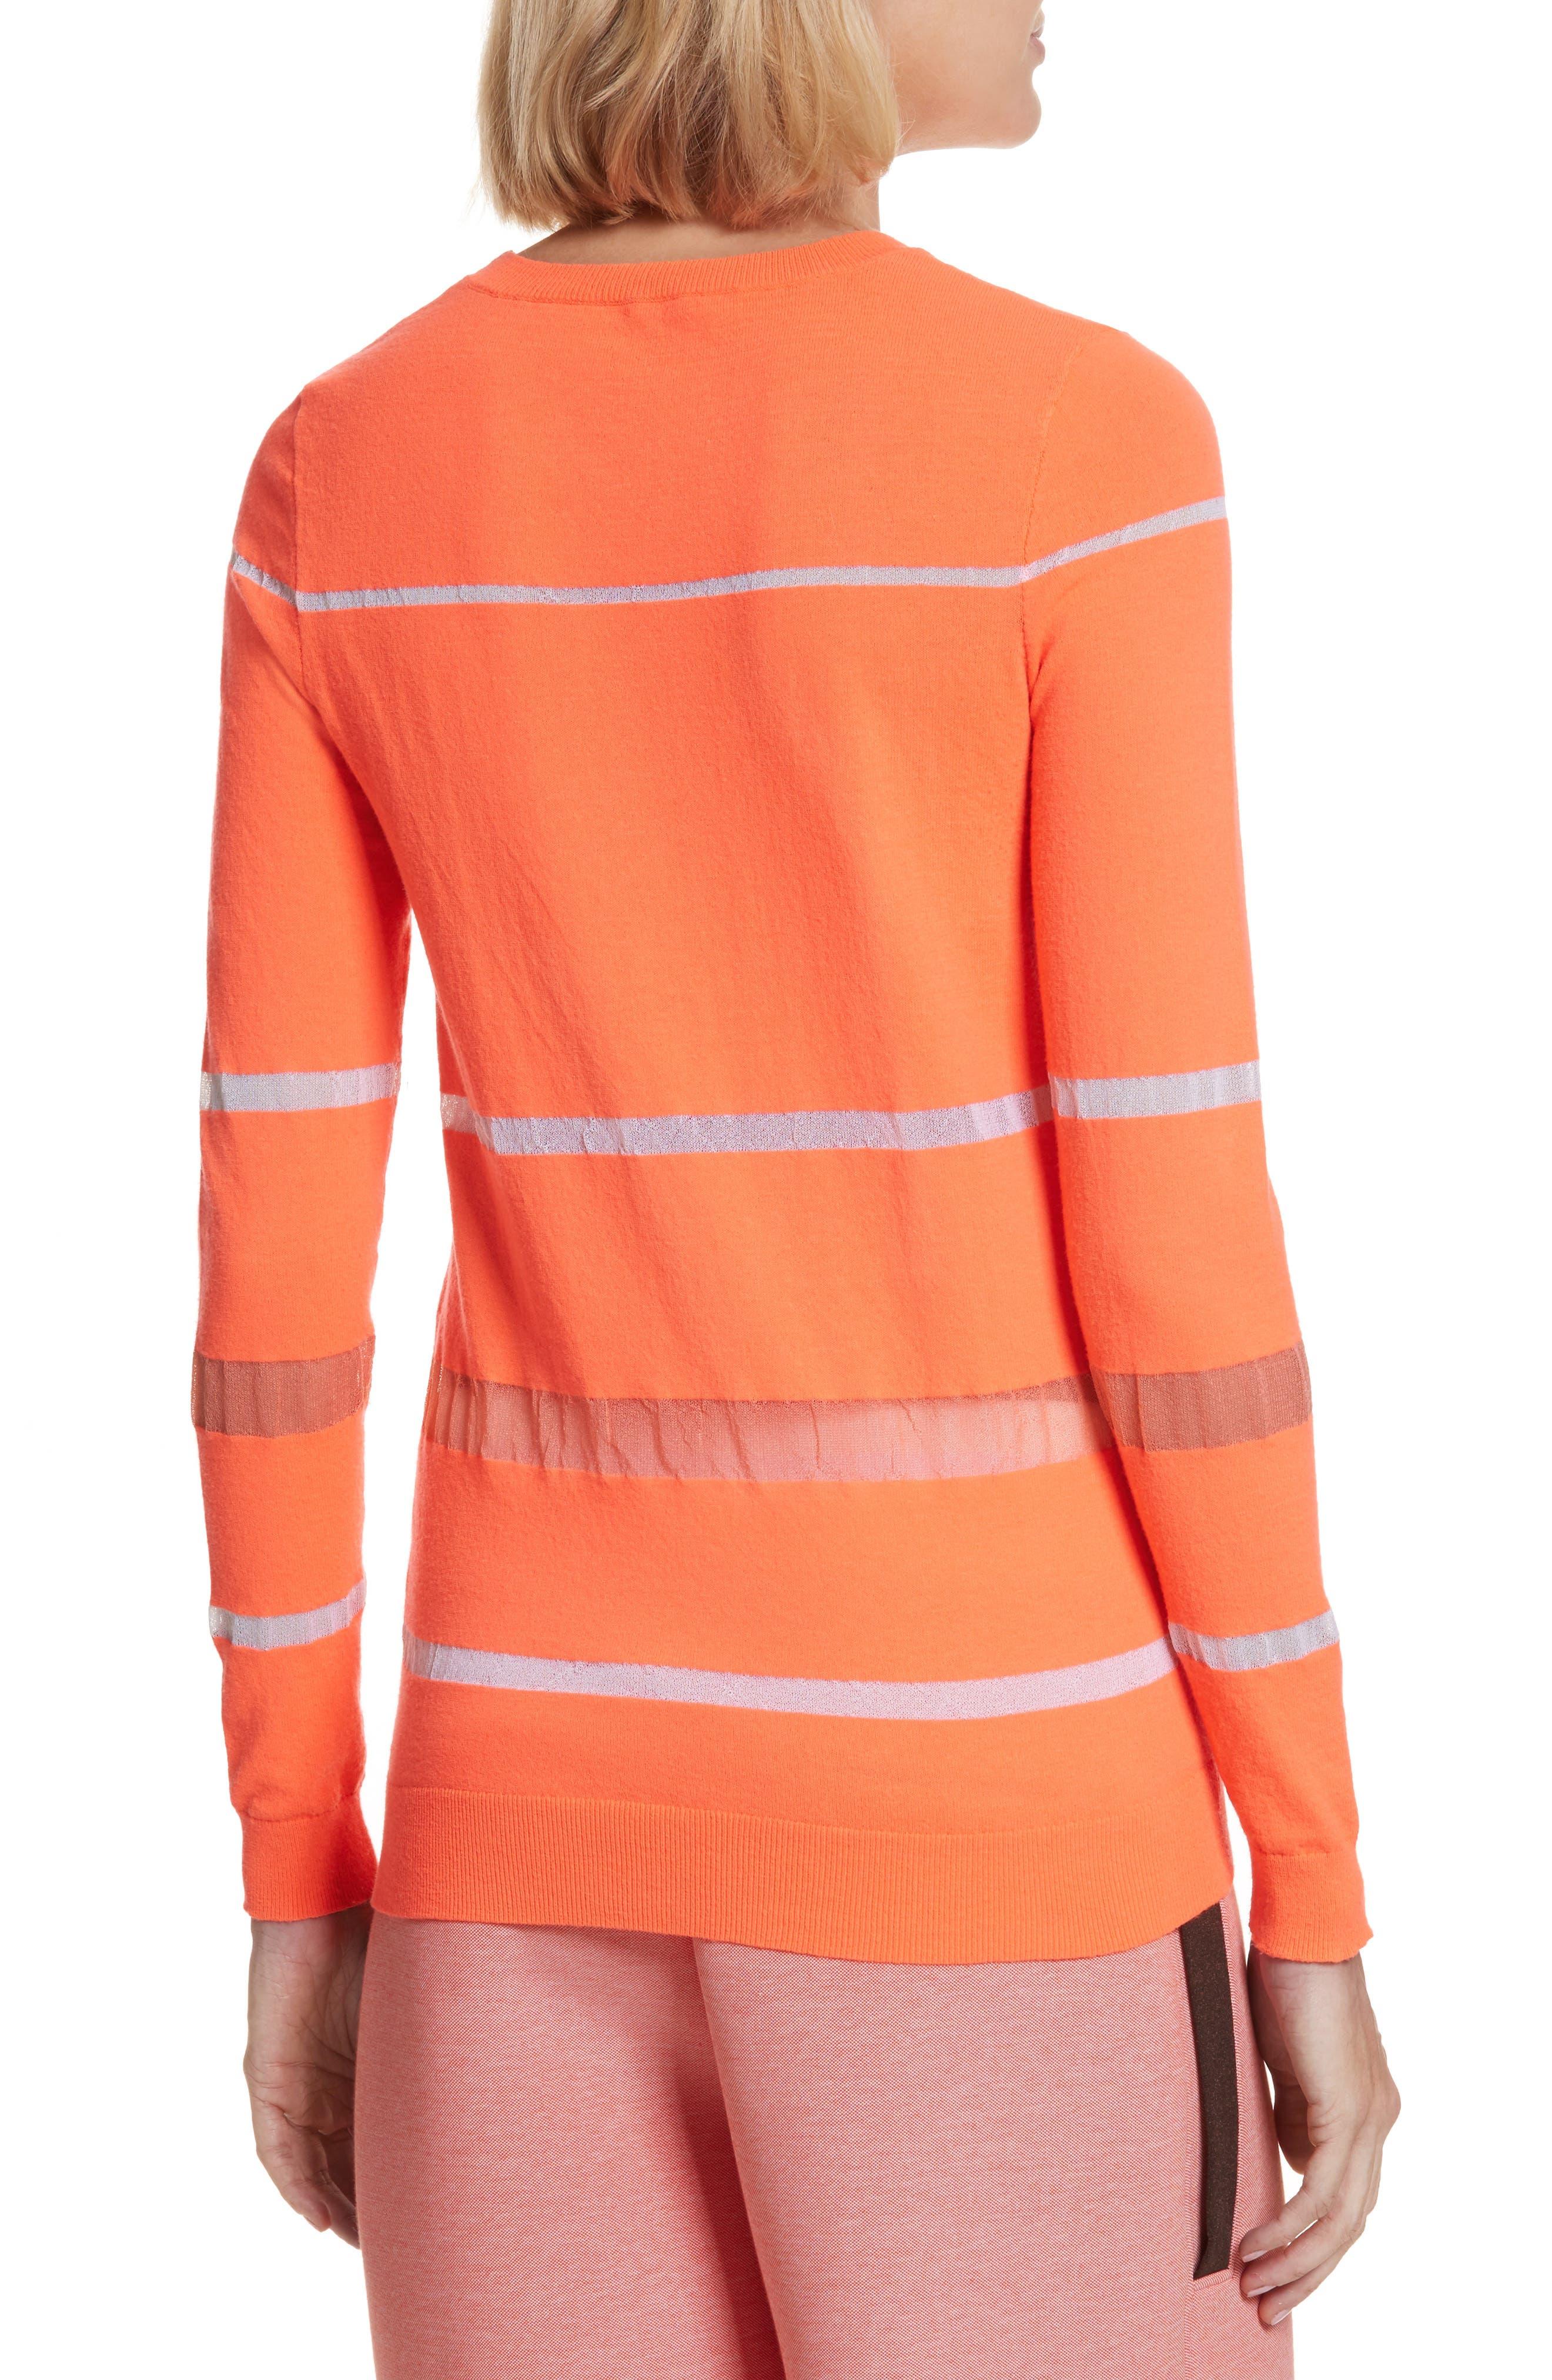 Alternate Image 3  - Neverbefore Illusion Stripe Crewneck Sweater